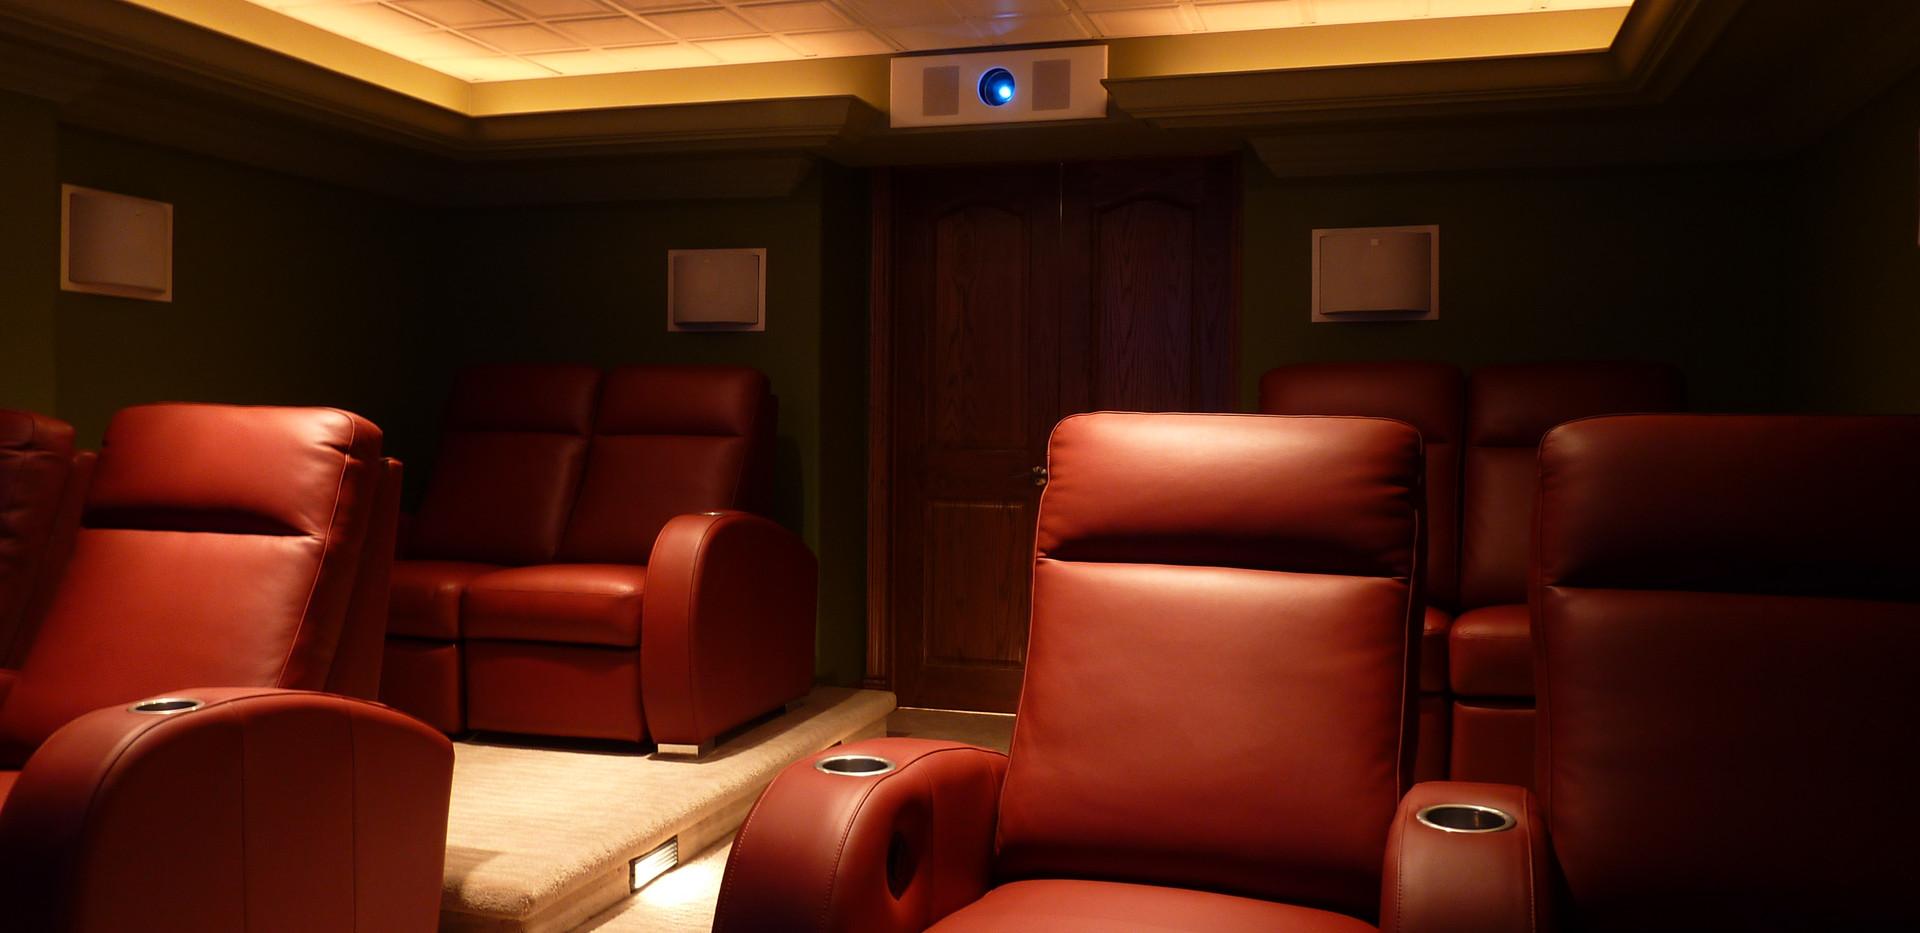 Dedicated Home Theatre